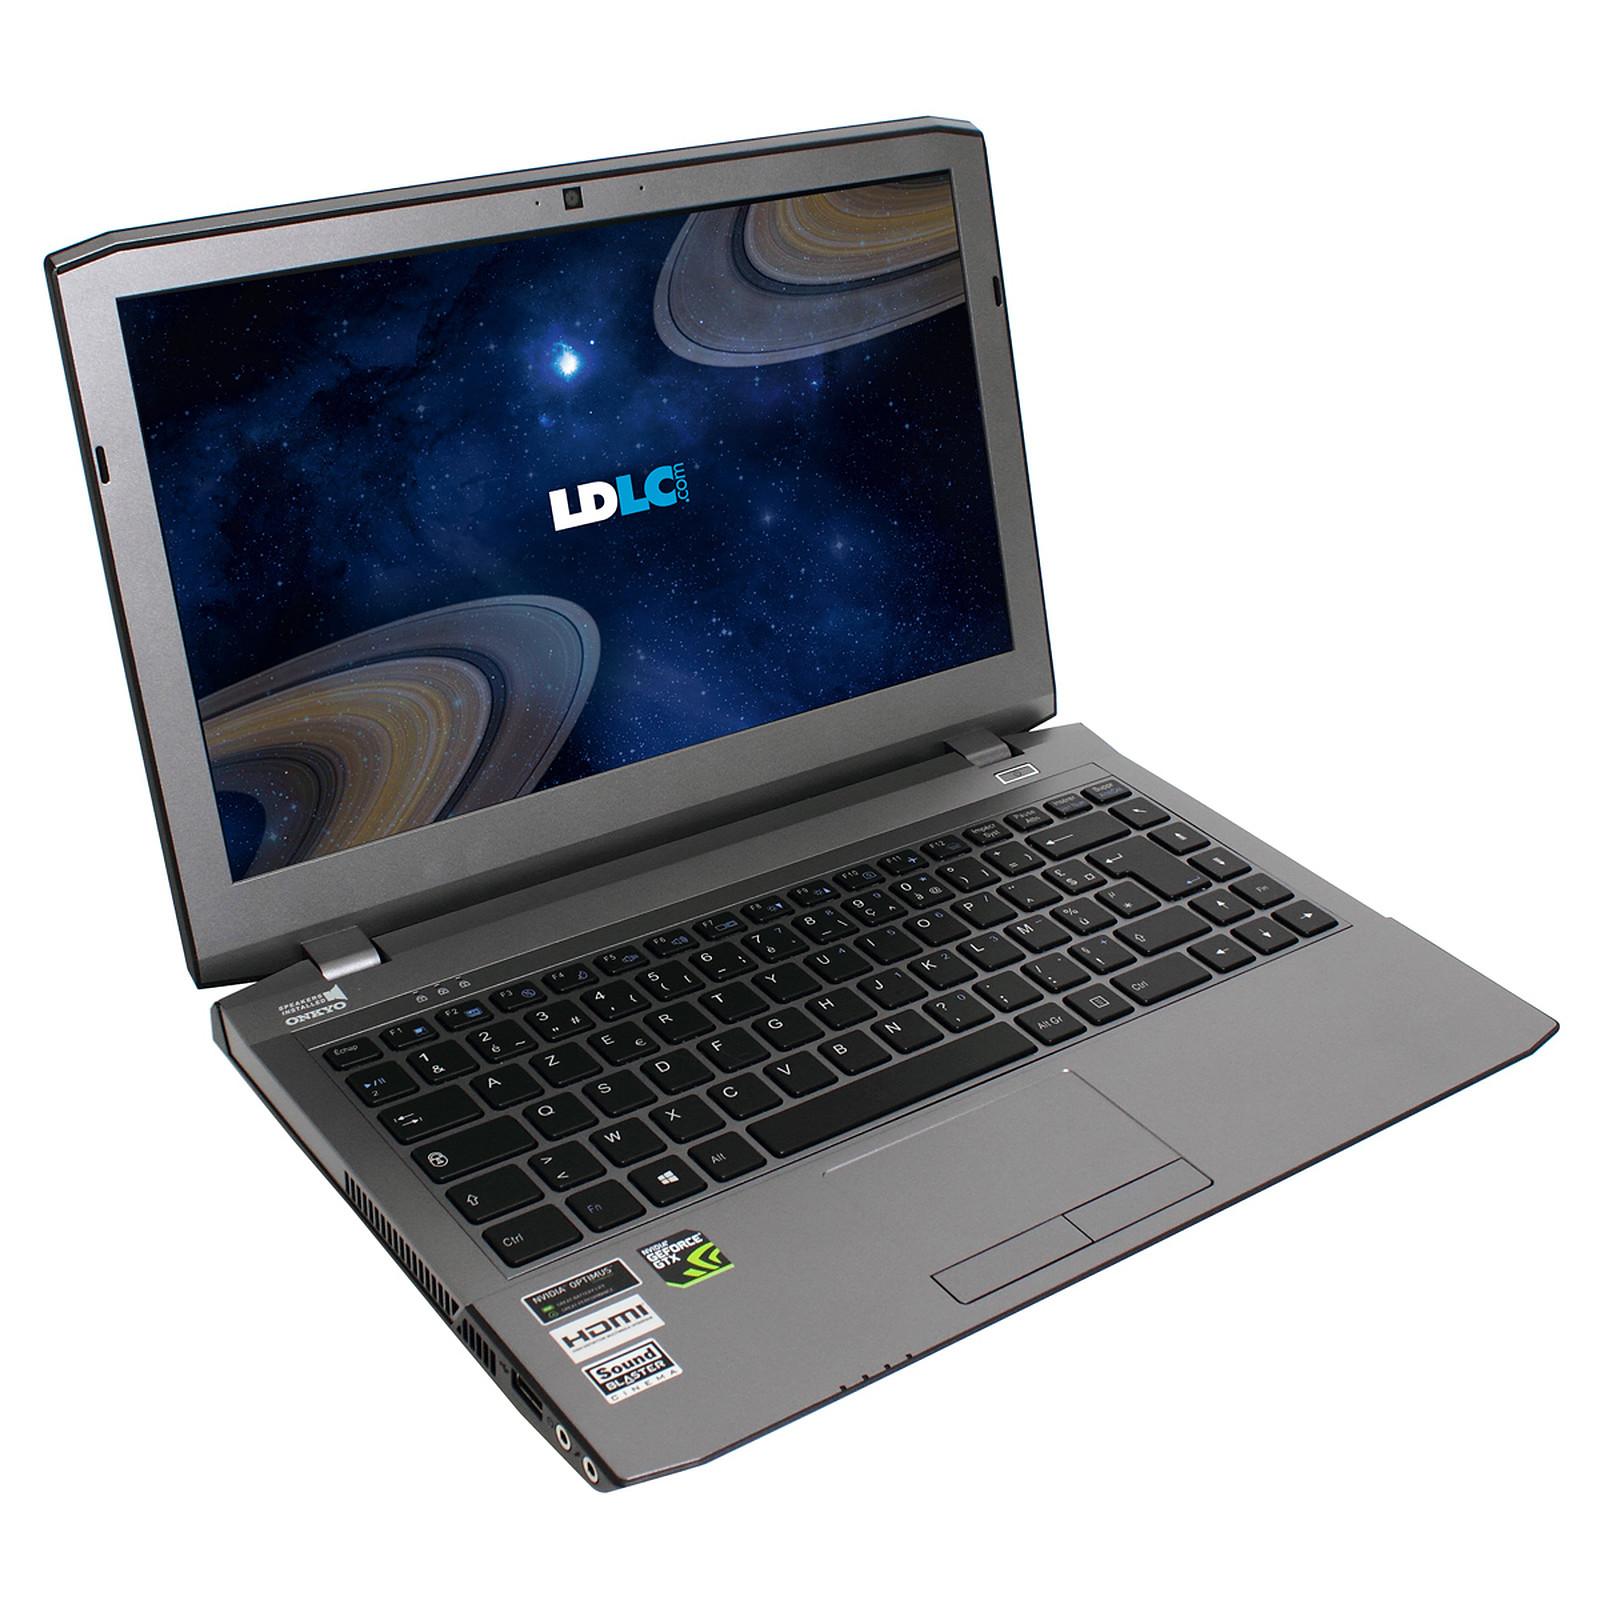 LDLC Saturne MB2-I5-8-S1